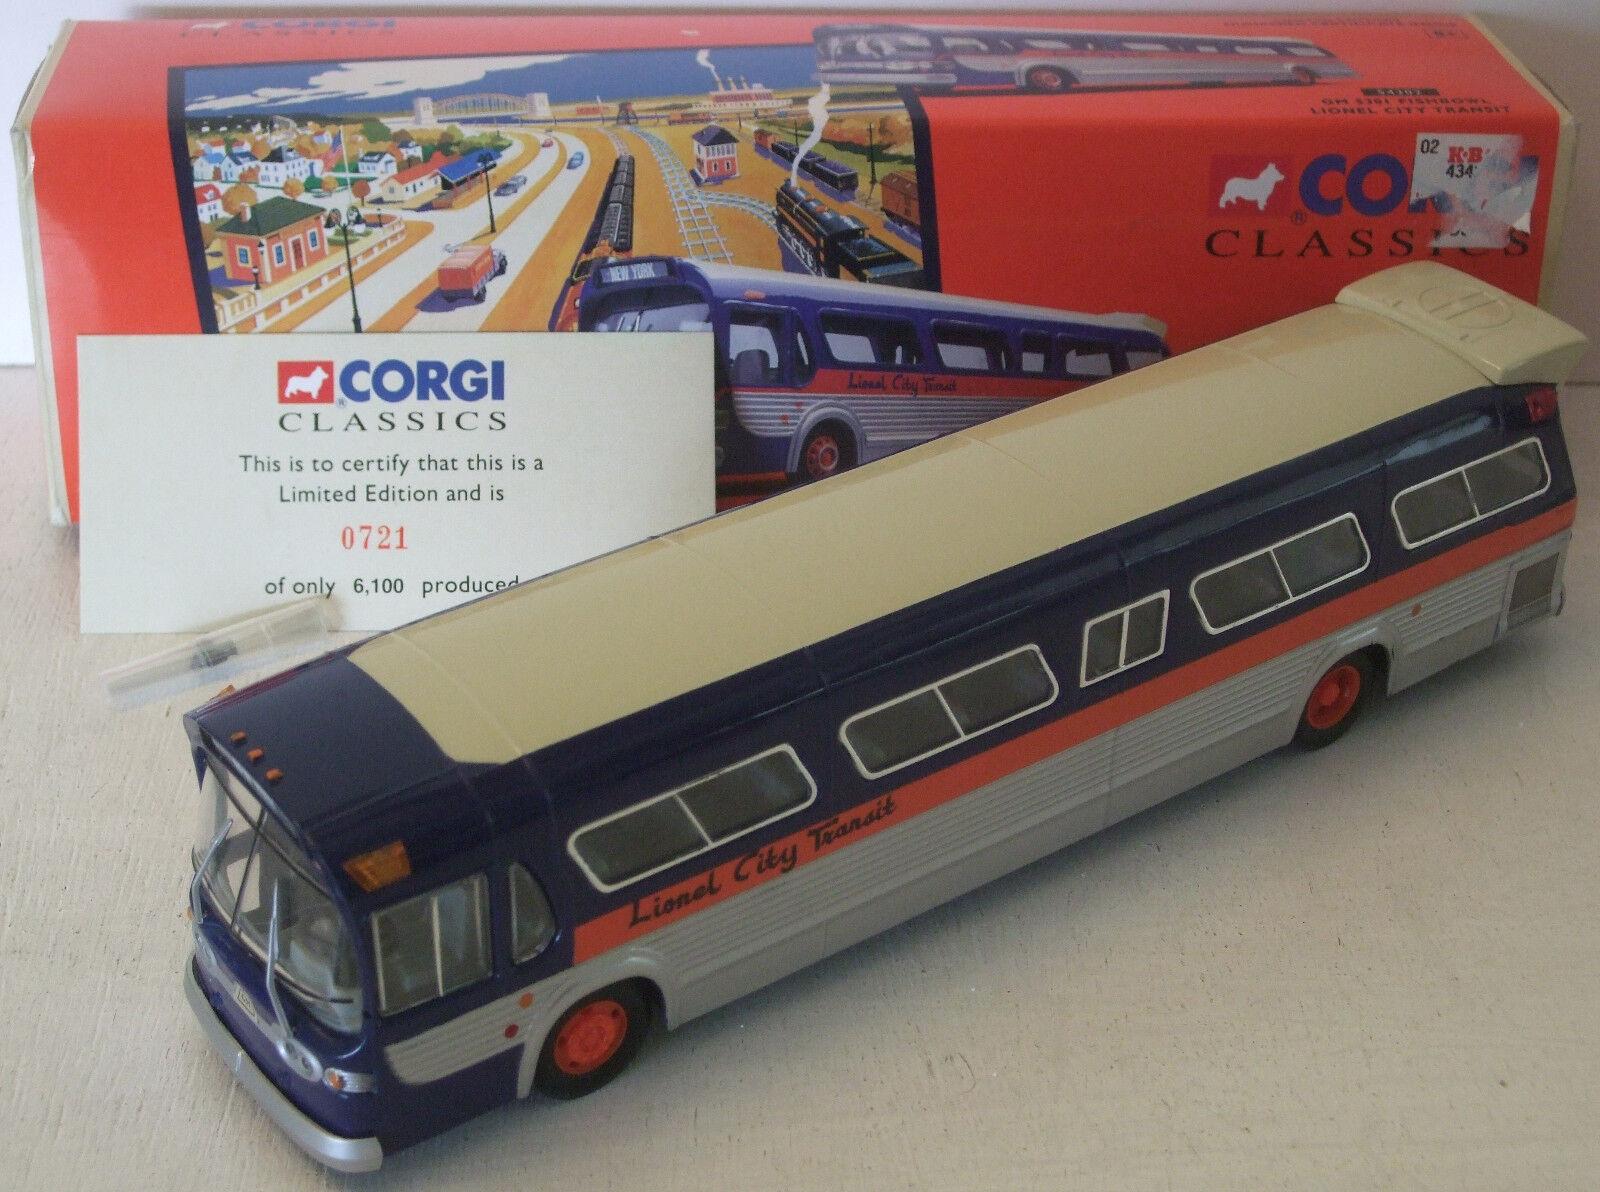 Corgi Fishbowl Lionel City Transit Bus GM 5301 Nuovo in Box 54302 w/mirrors & card